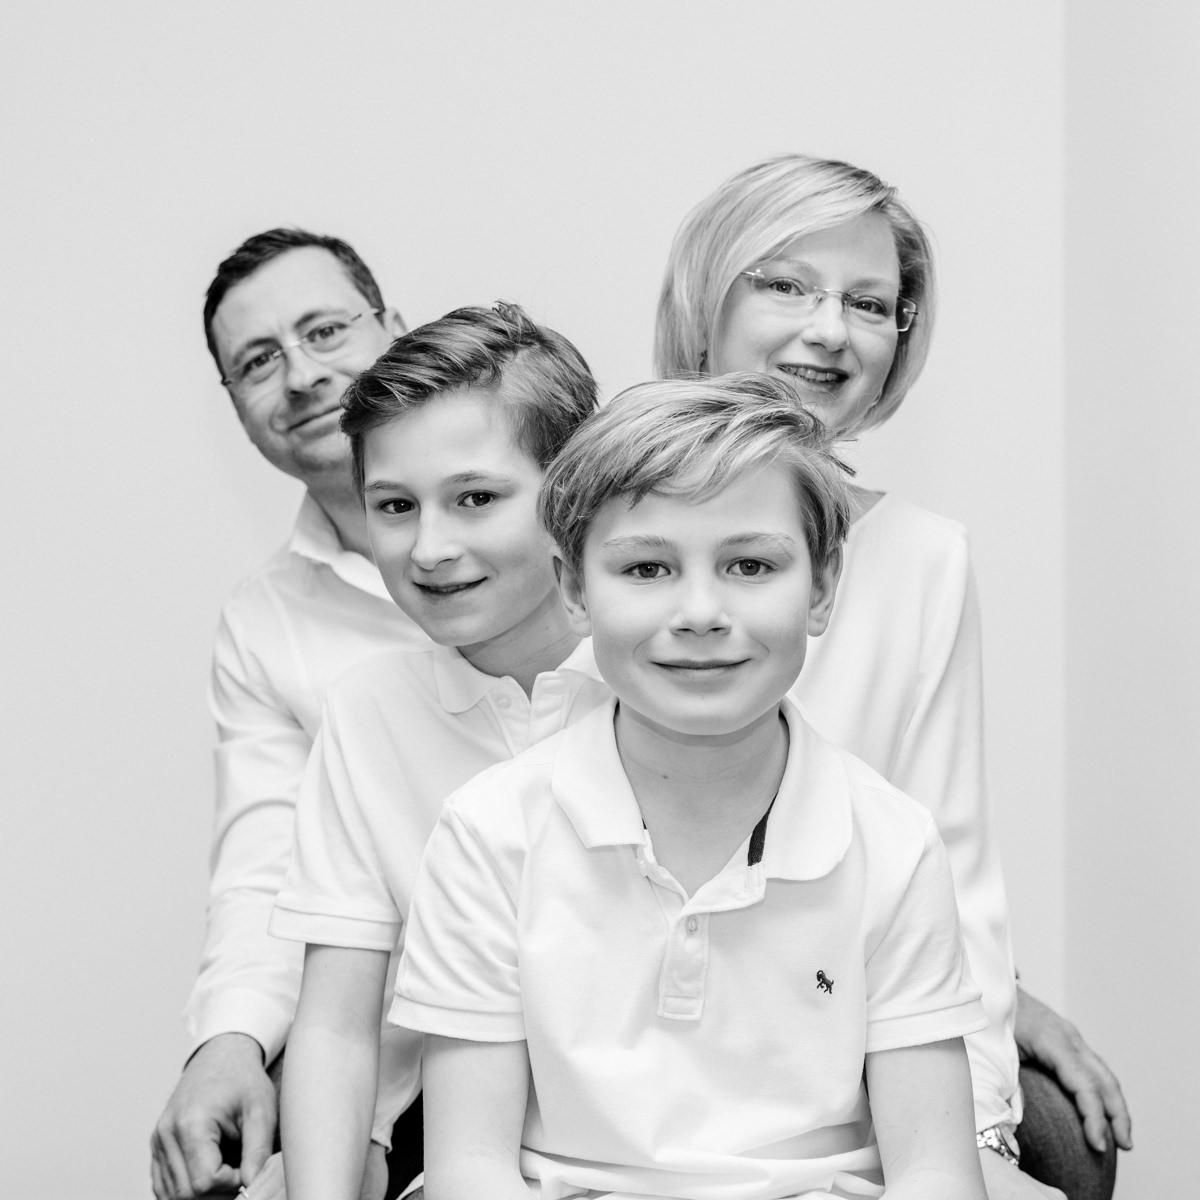 Familie im Glück, Familienshooting, Familienfotograf, Family Shooting, Teenbilder, Homestory, Familienshooting Schweinfurt, Familienfotografie Schweinfurt, maizucker, Daggi Binder